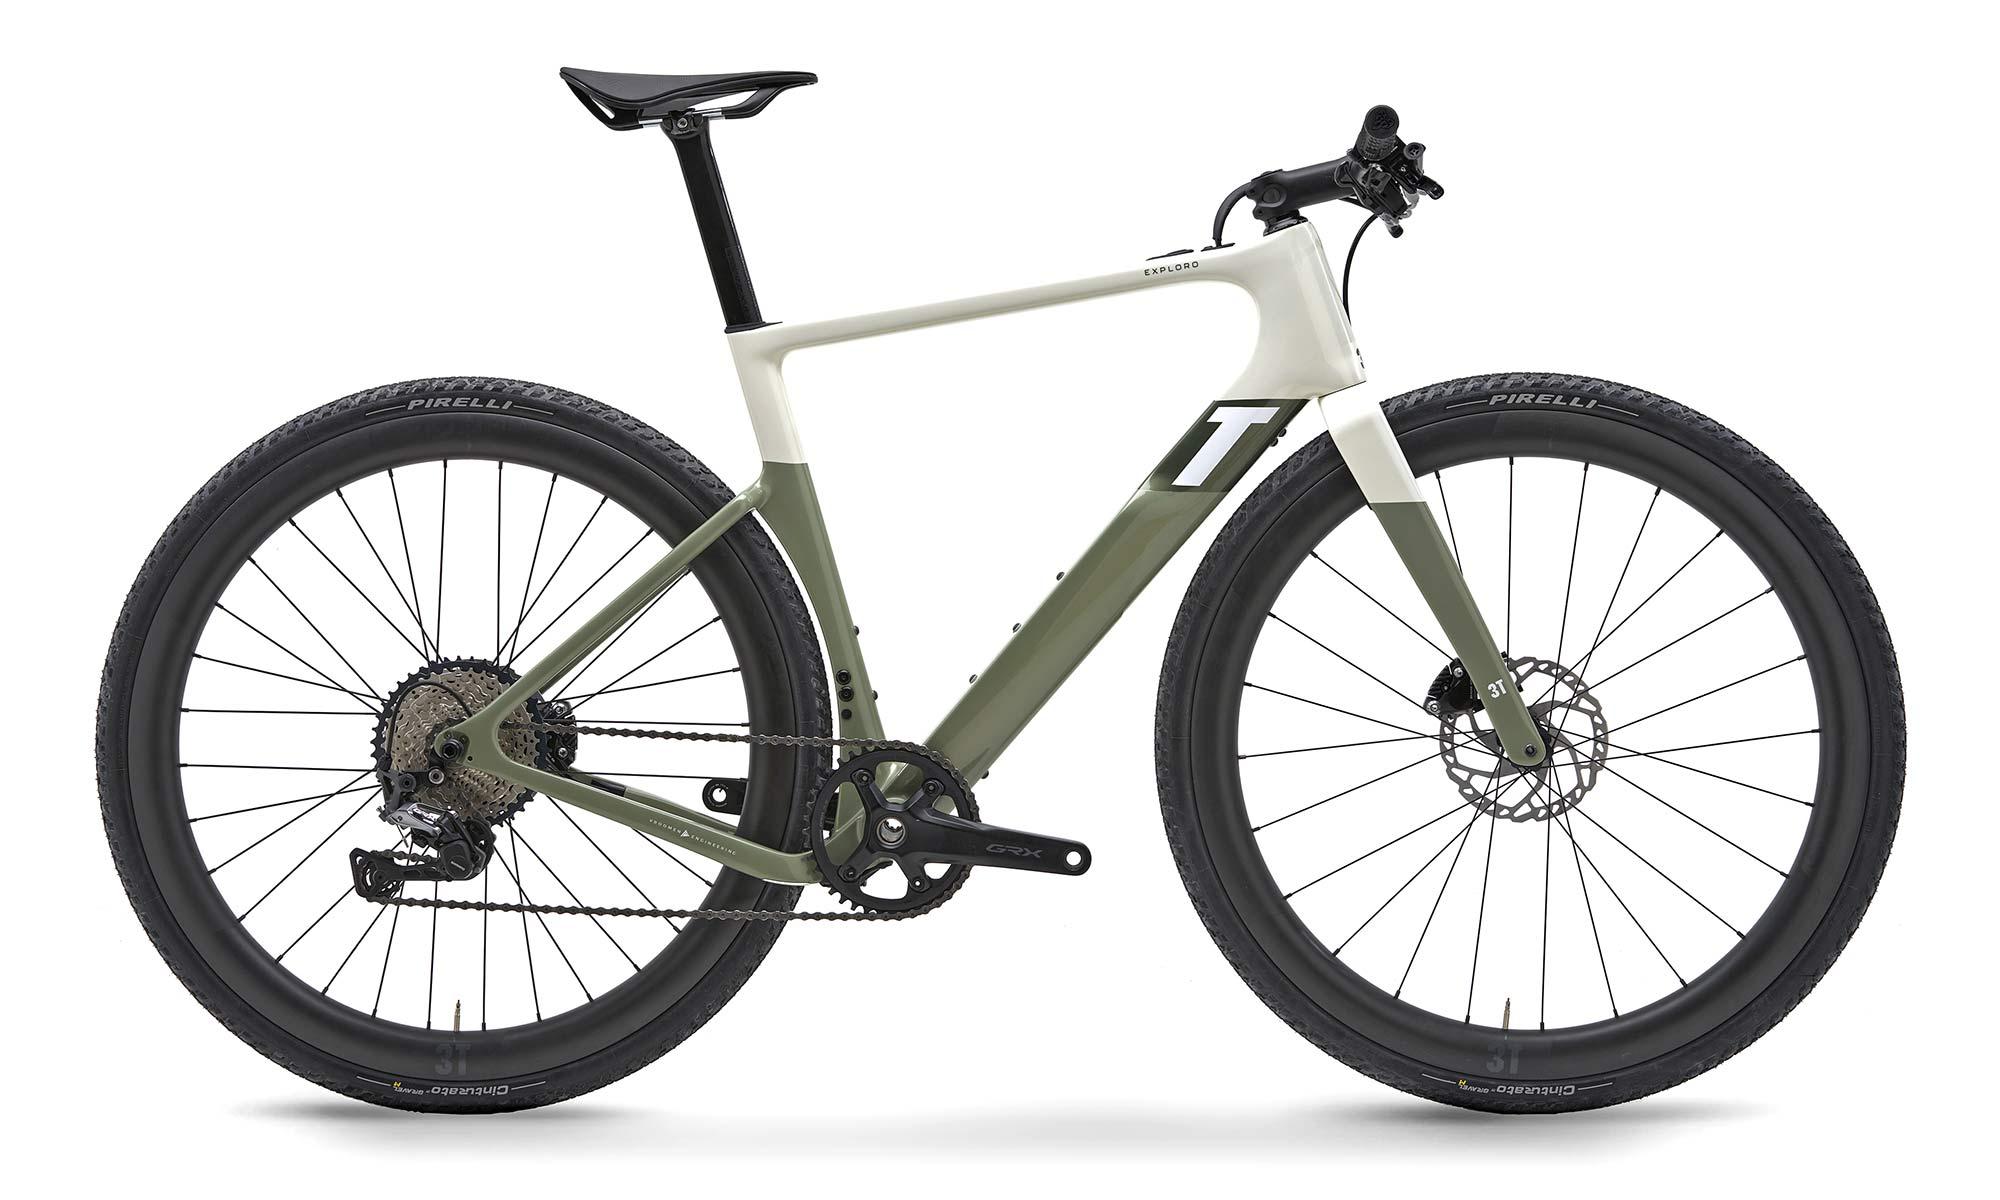 3T Exploro RaceMax Boost gravel e-bike, stealth ebikemotion X35 pedal-assist,flatbar